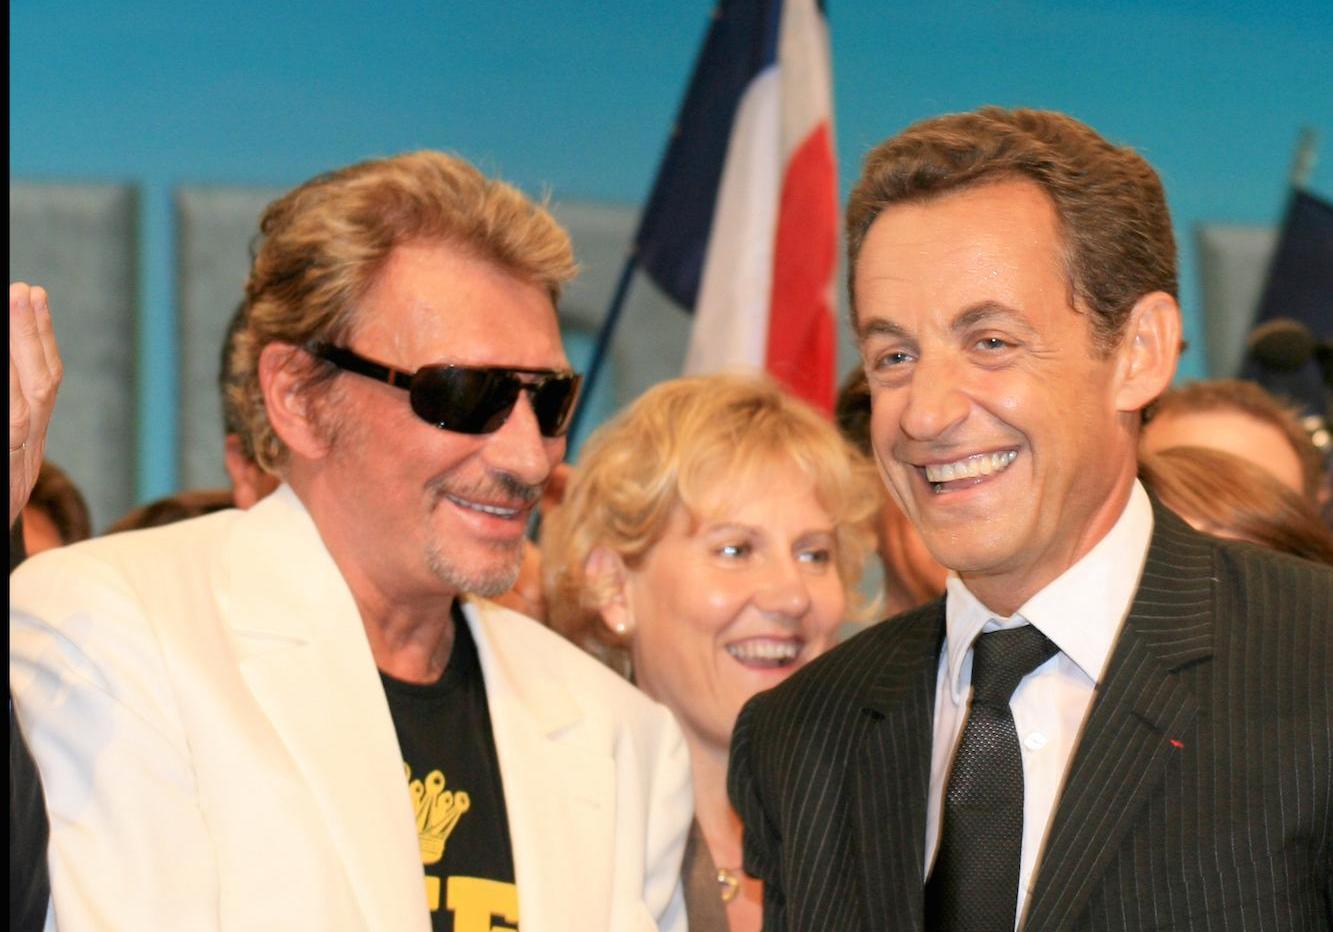 Johnny Hallyday Le Jour Ou Il A Accompagne Nicolas Sarkozy Se